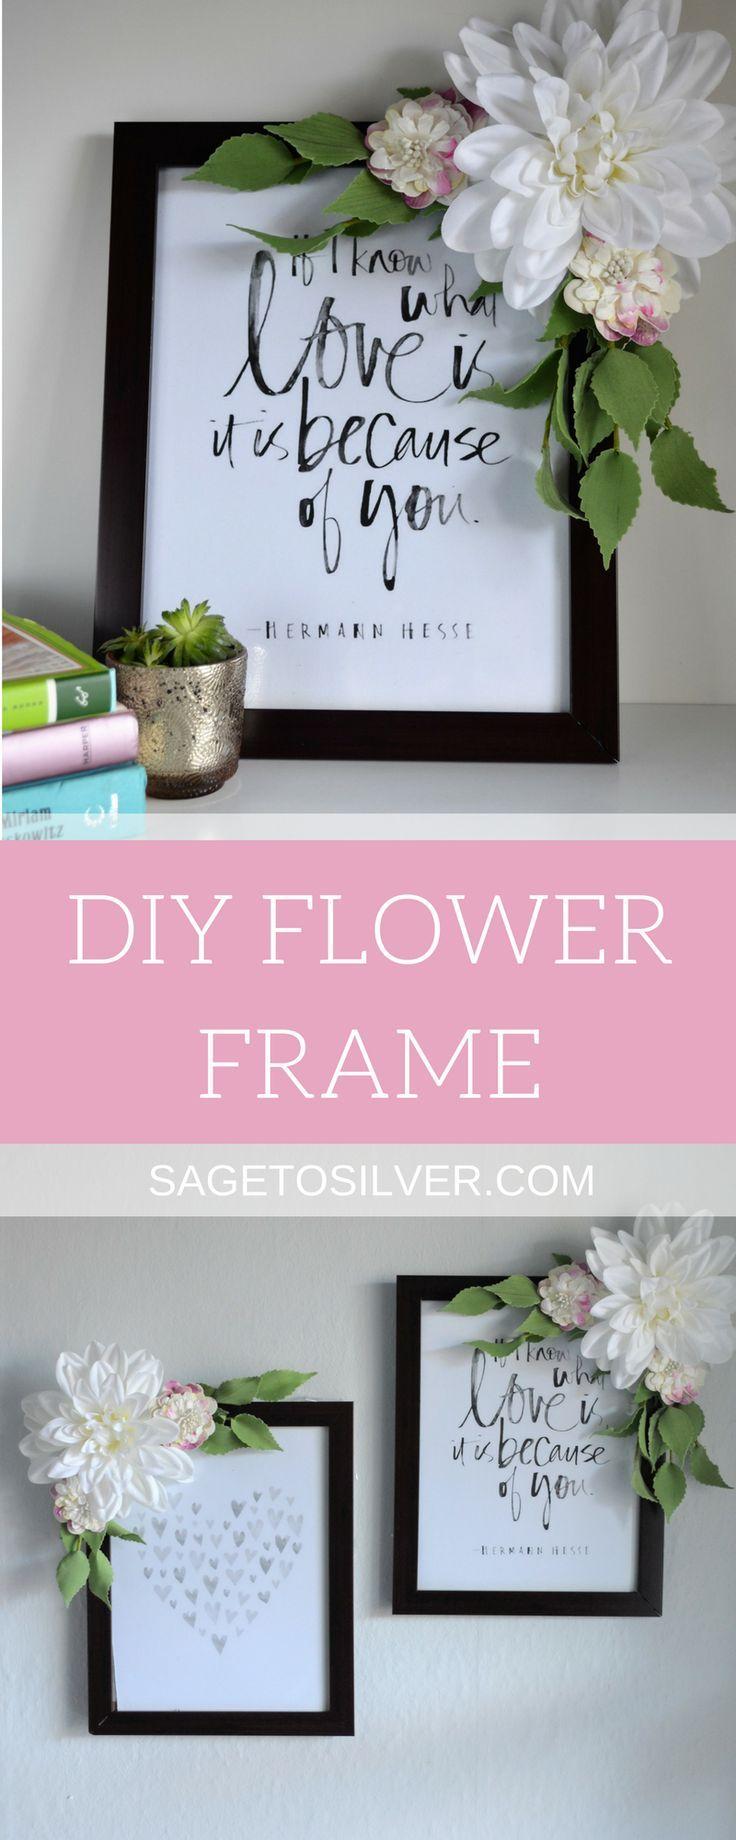 DIY Flower Frame | Flower frame, Diy flower and Diy room decor